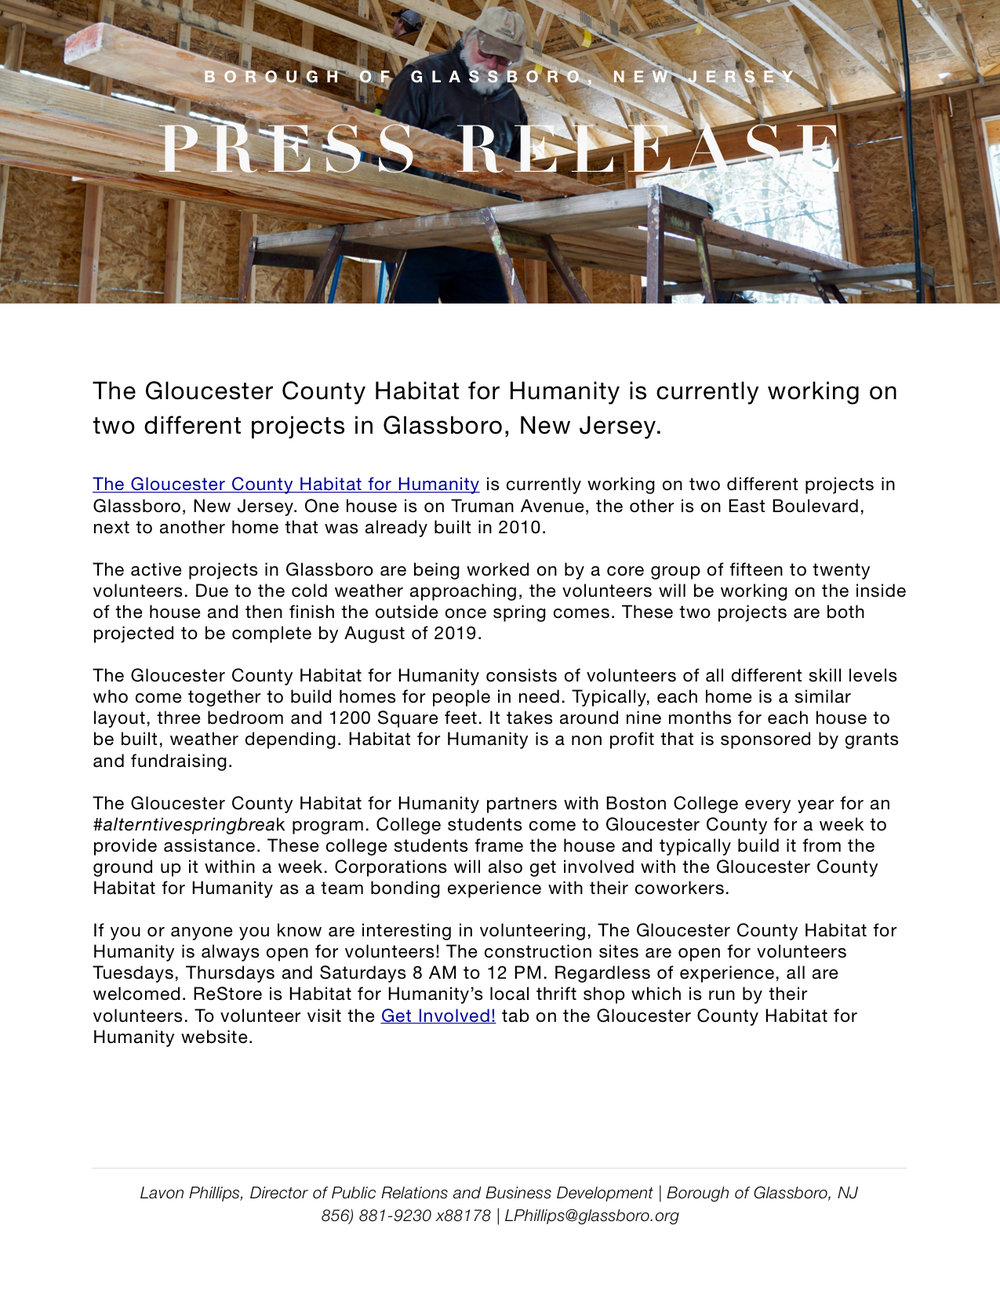 Glassboro NJ Press release Habitat for Humanity.jpeg